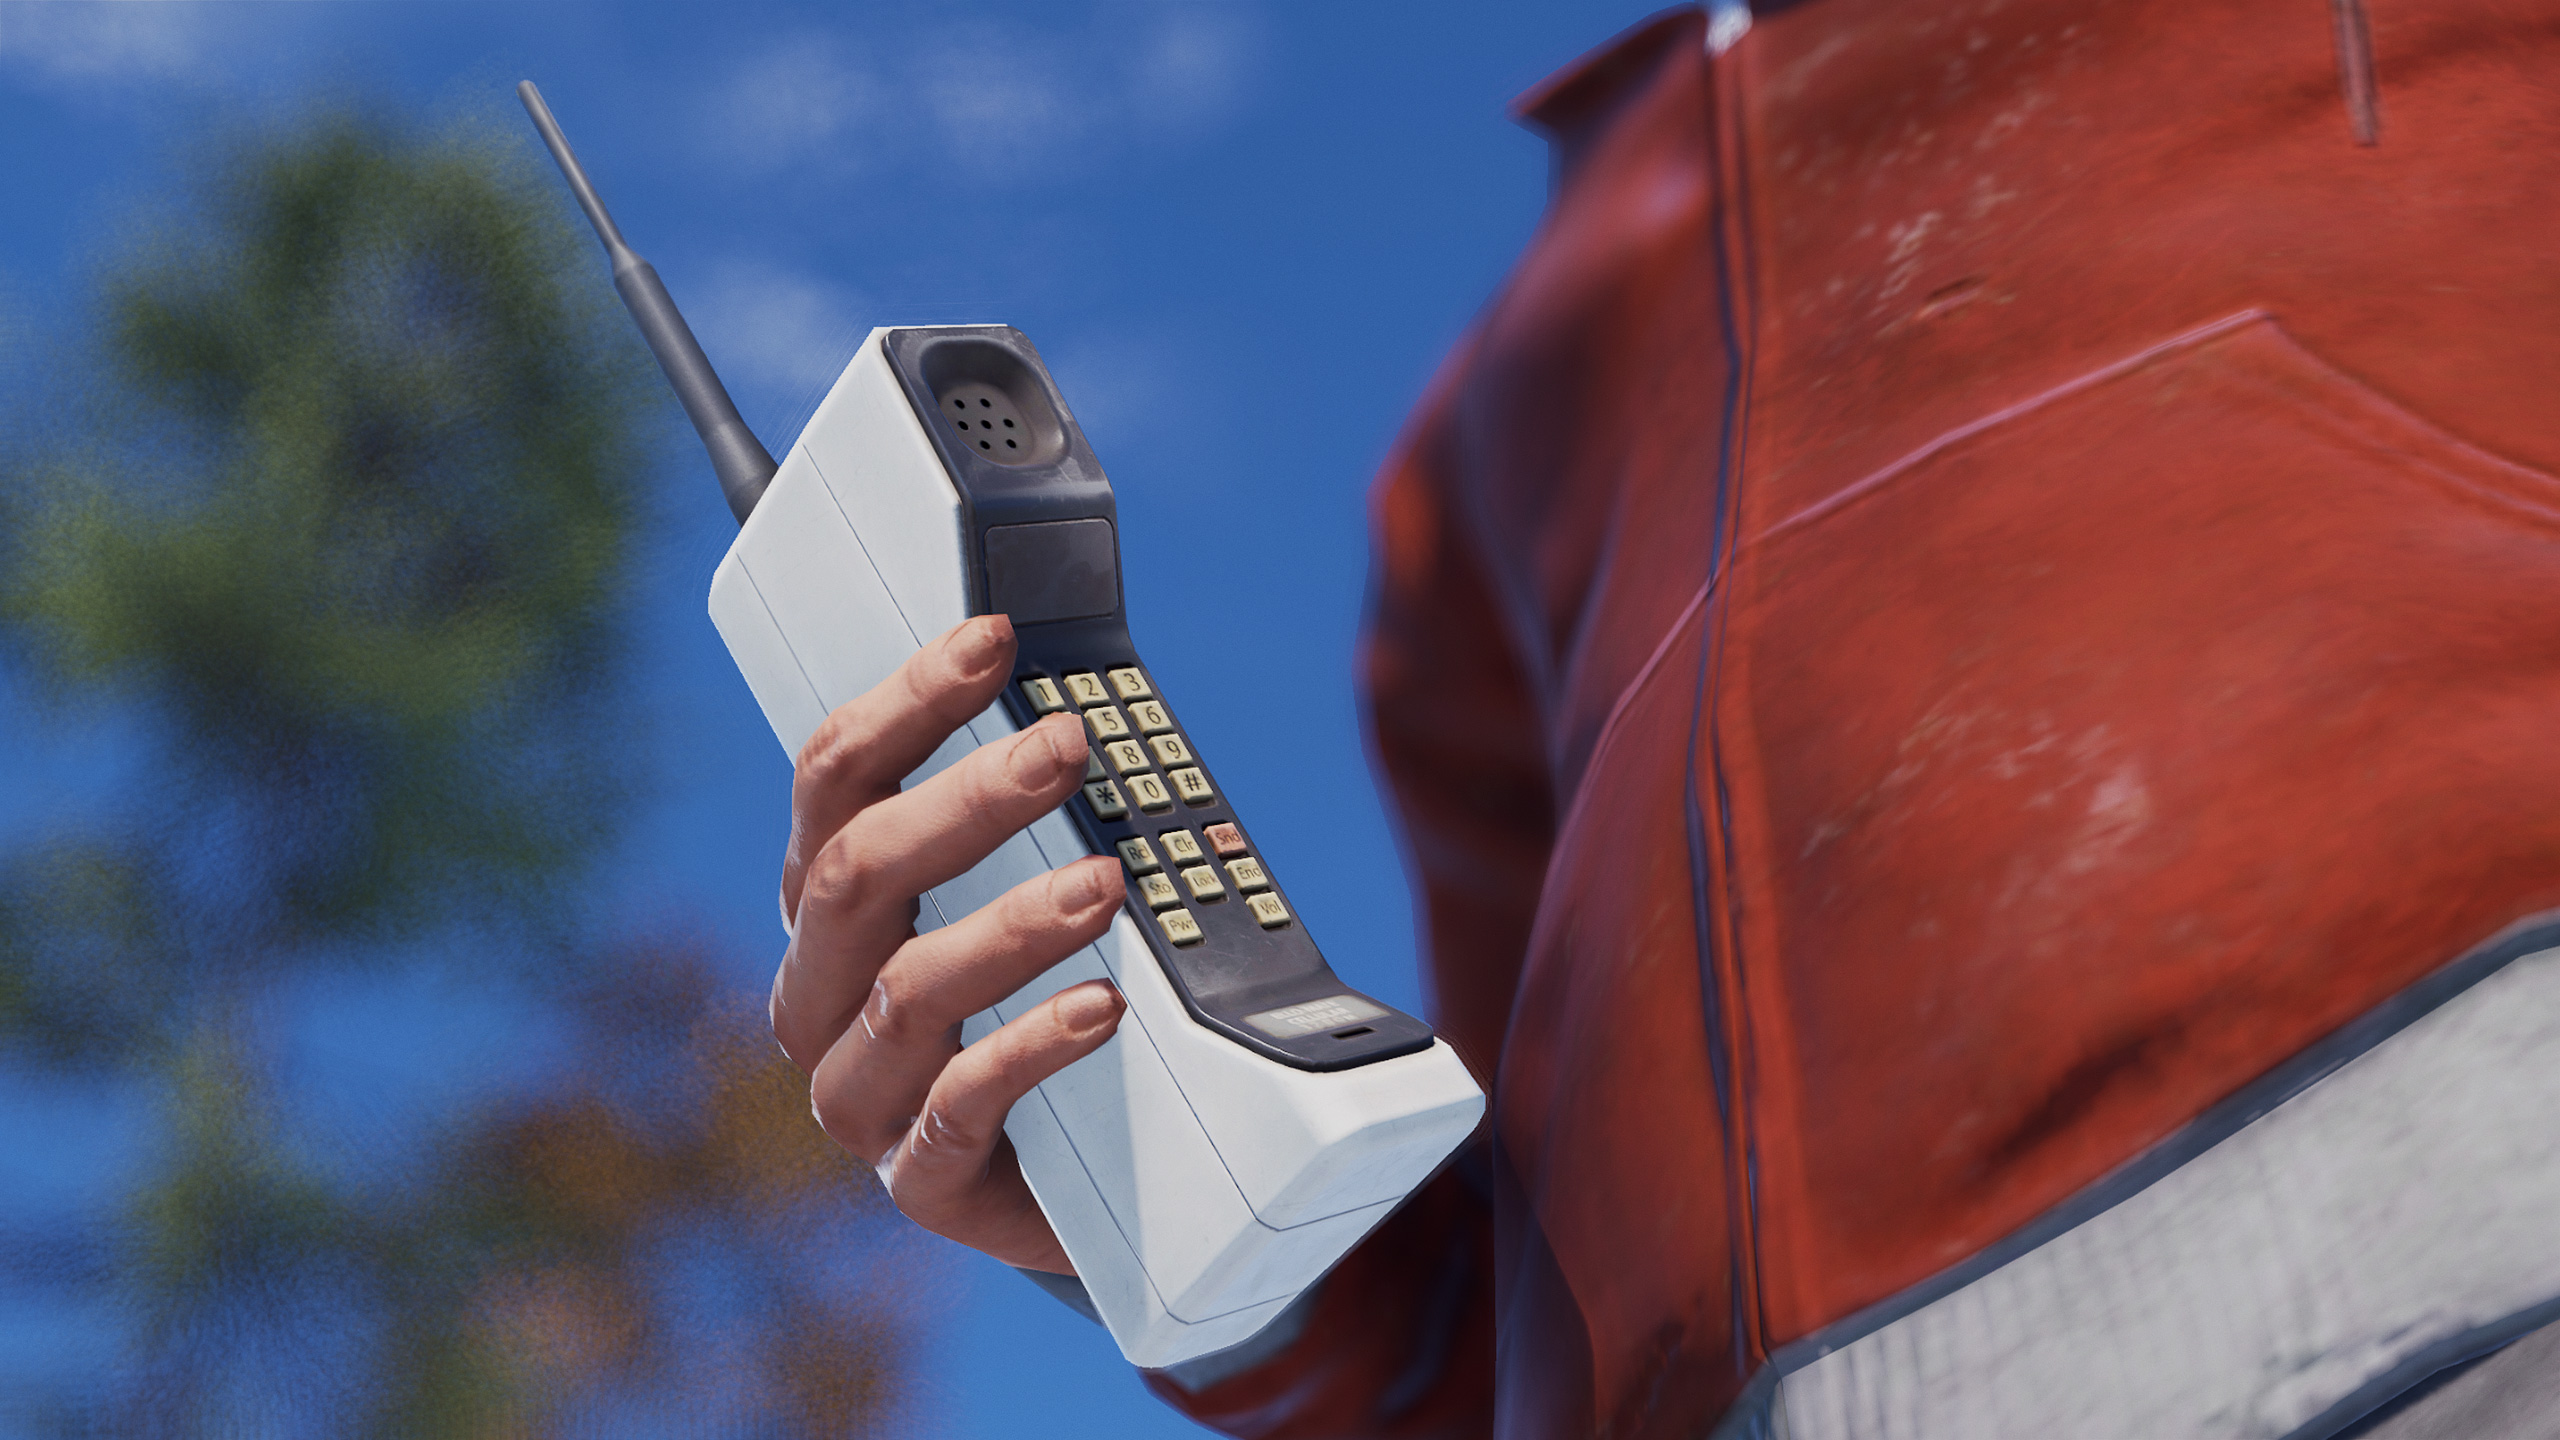 mobilephone1.jpg